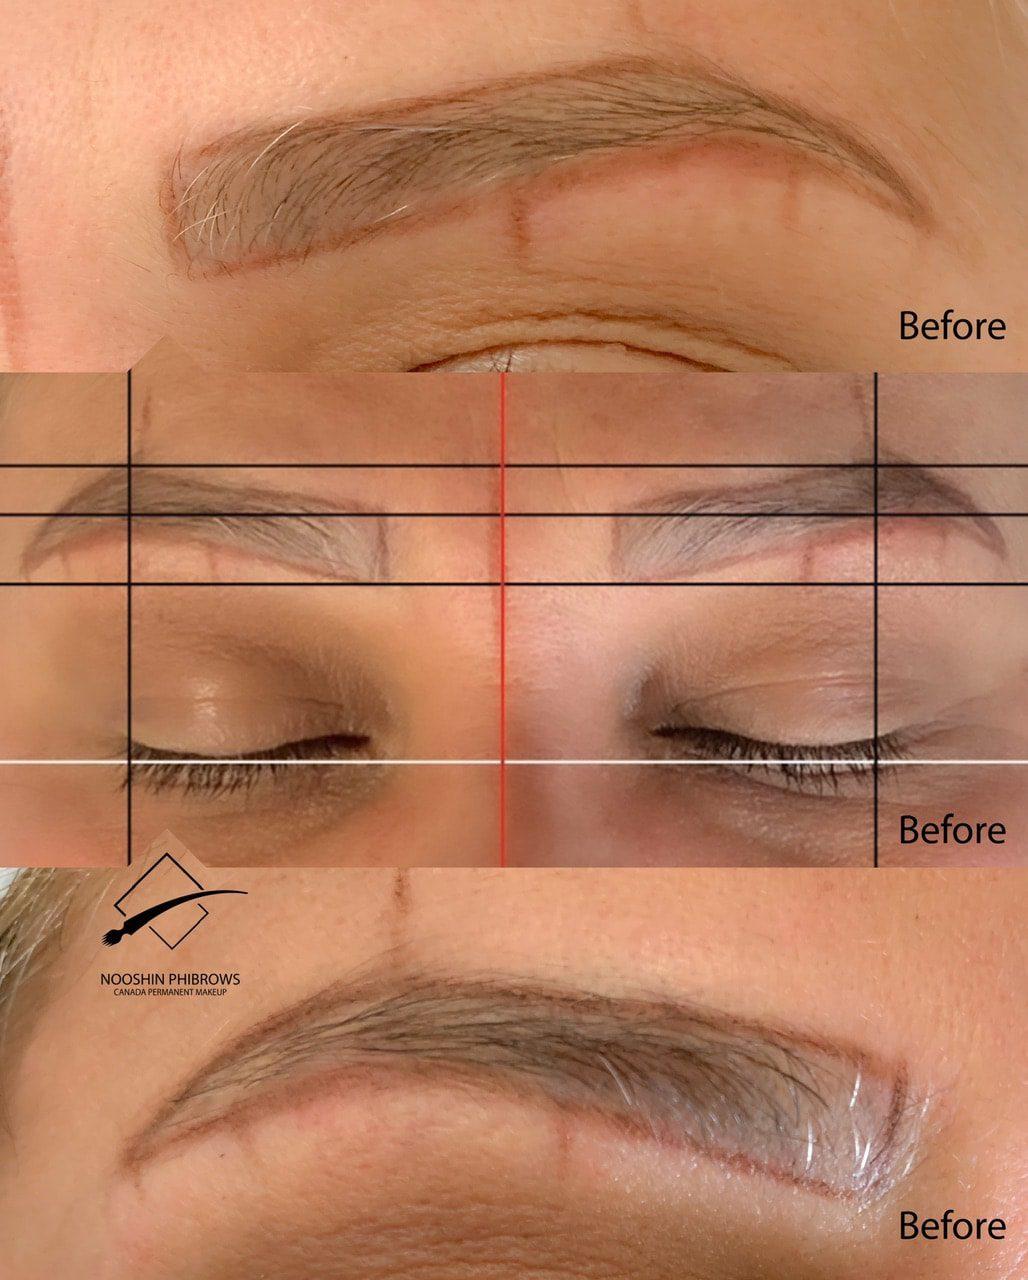 PHIAPP SHAPING (CODE: MB2) – Canada Makeup – IMG 4561 min – Canada Makeup – NOOSHIN JAVAHERIAN